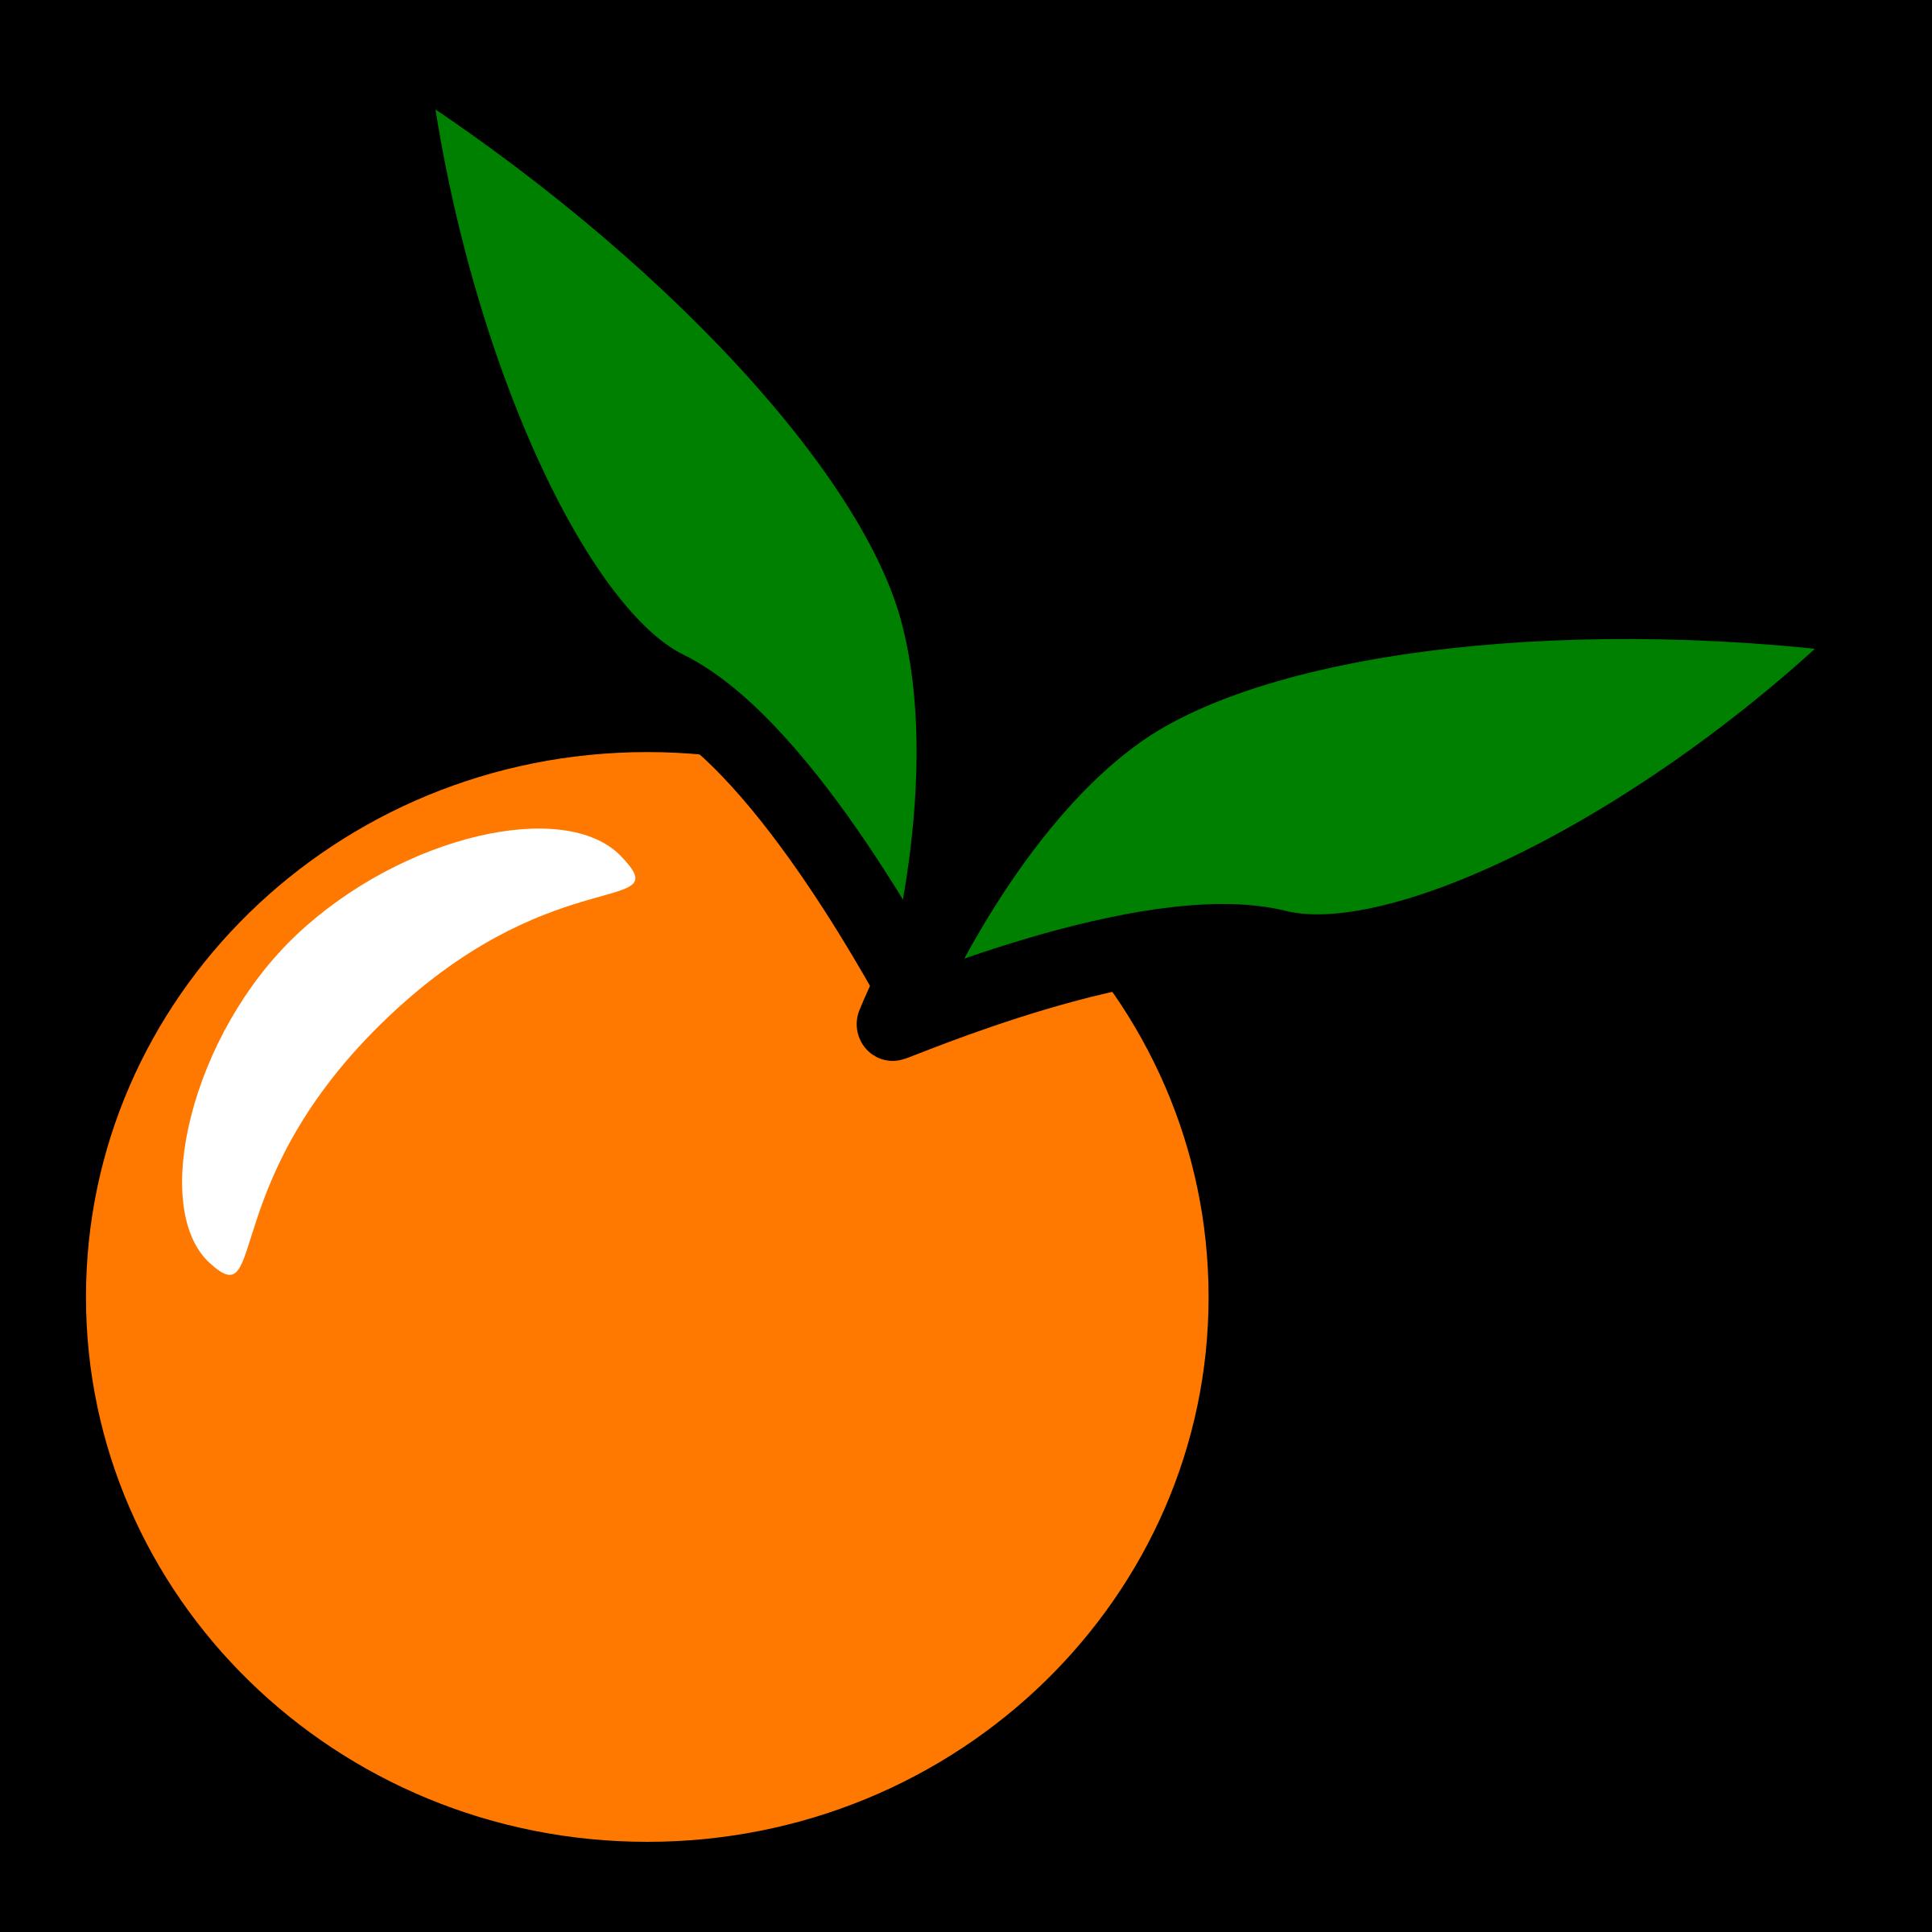 clipart orange icon